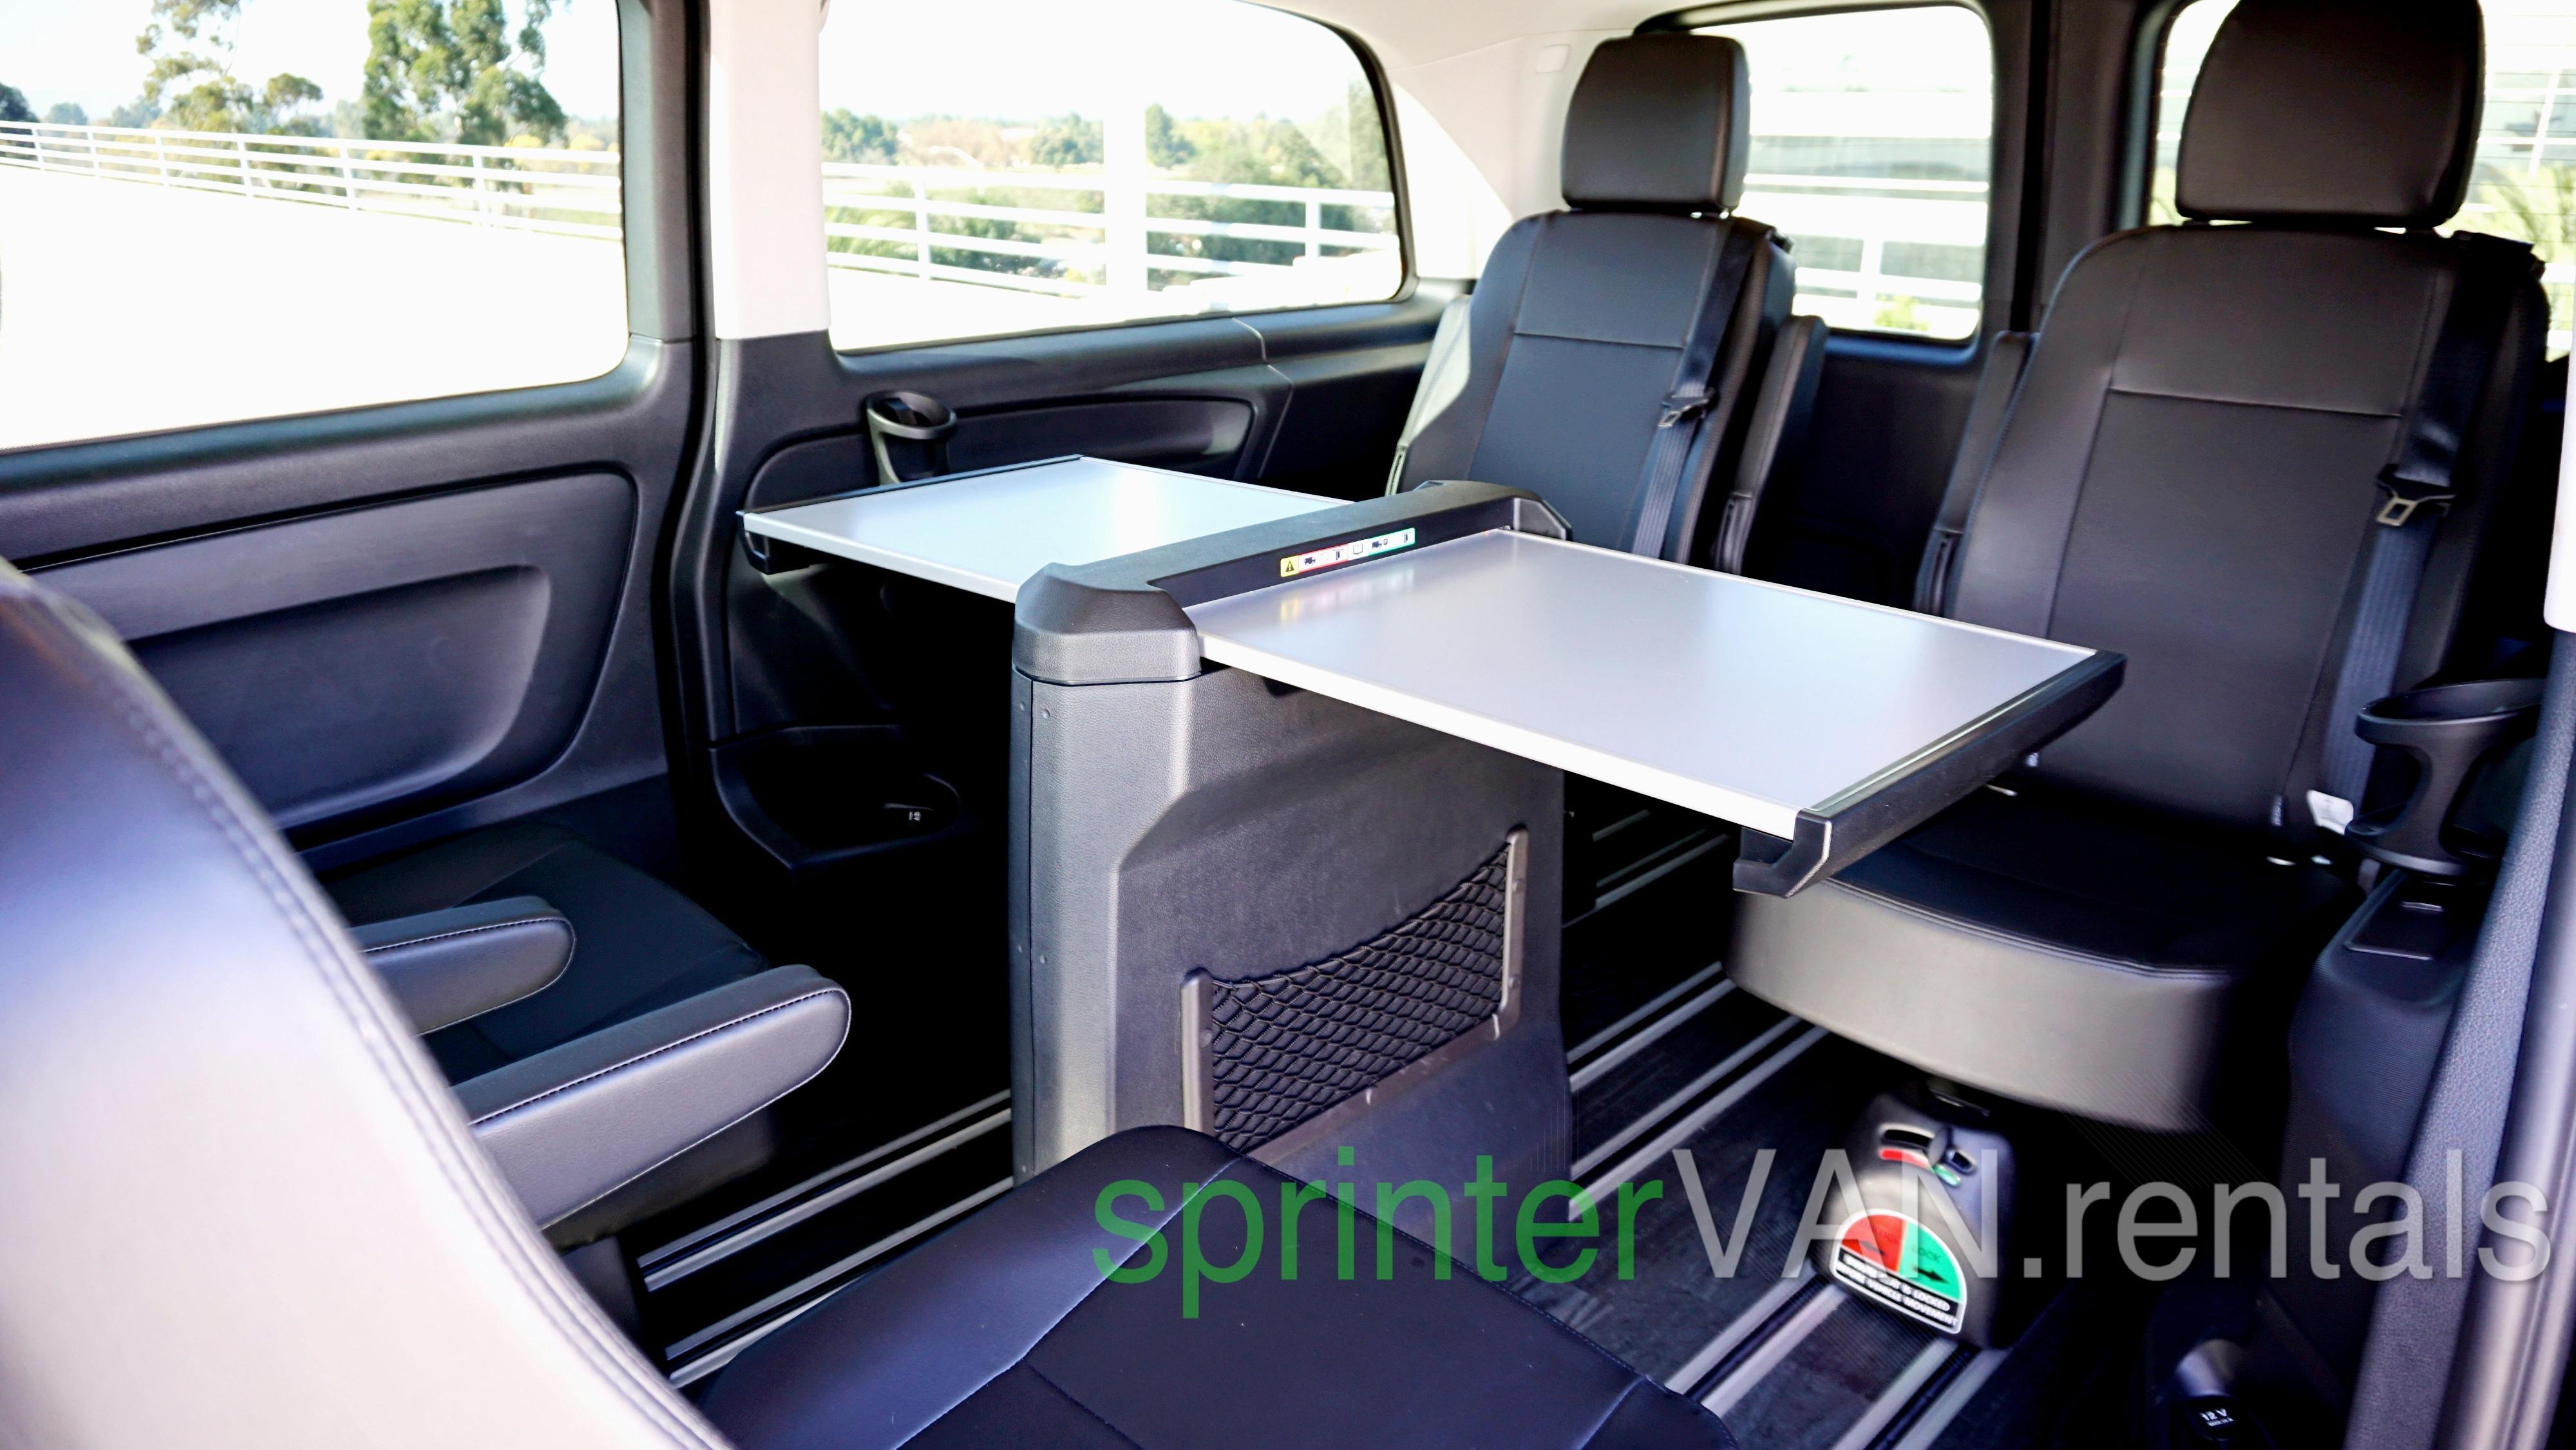 SprinterVan.Rentals image 2